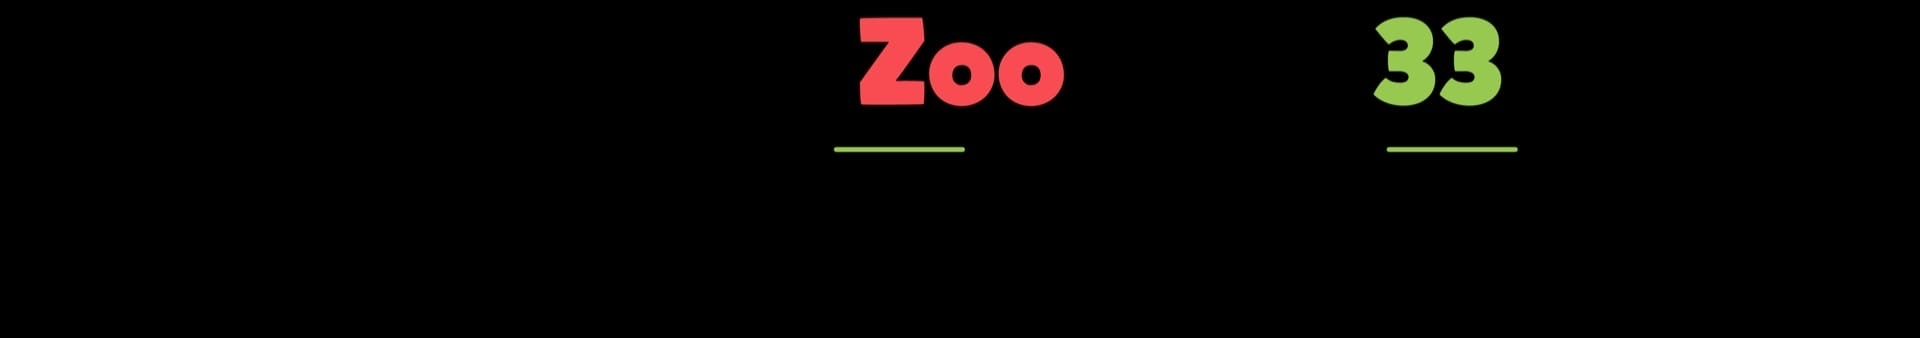 Интернет-магазин Zookorm33